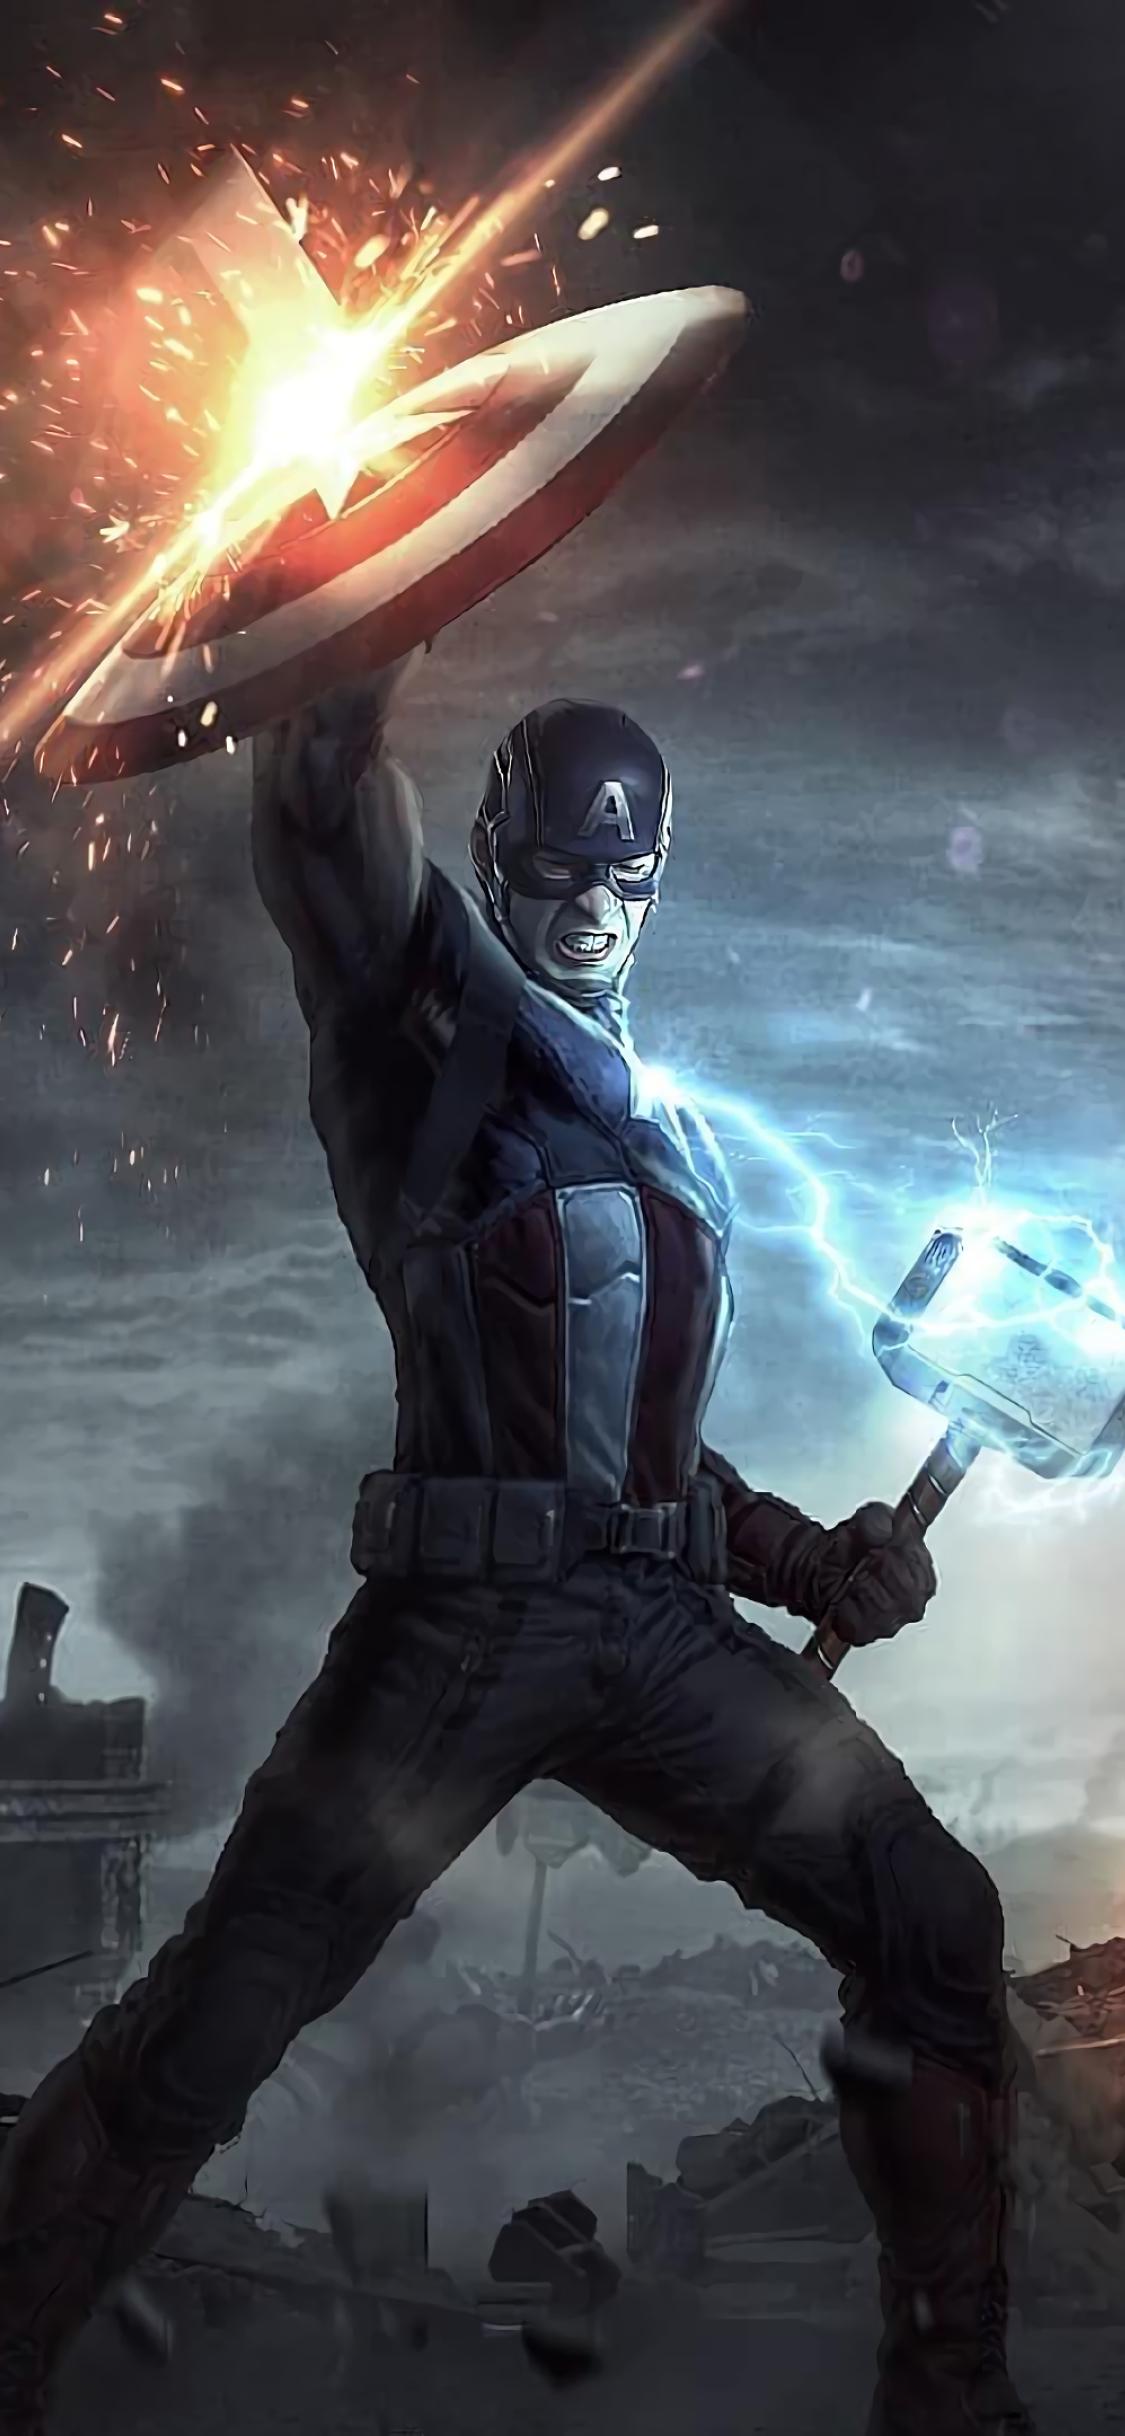 Captain America Hd 4k Mobile Wallpapers - Wallpaper Cave